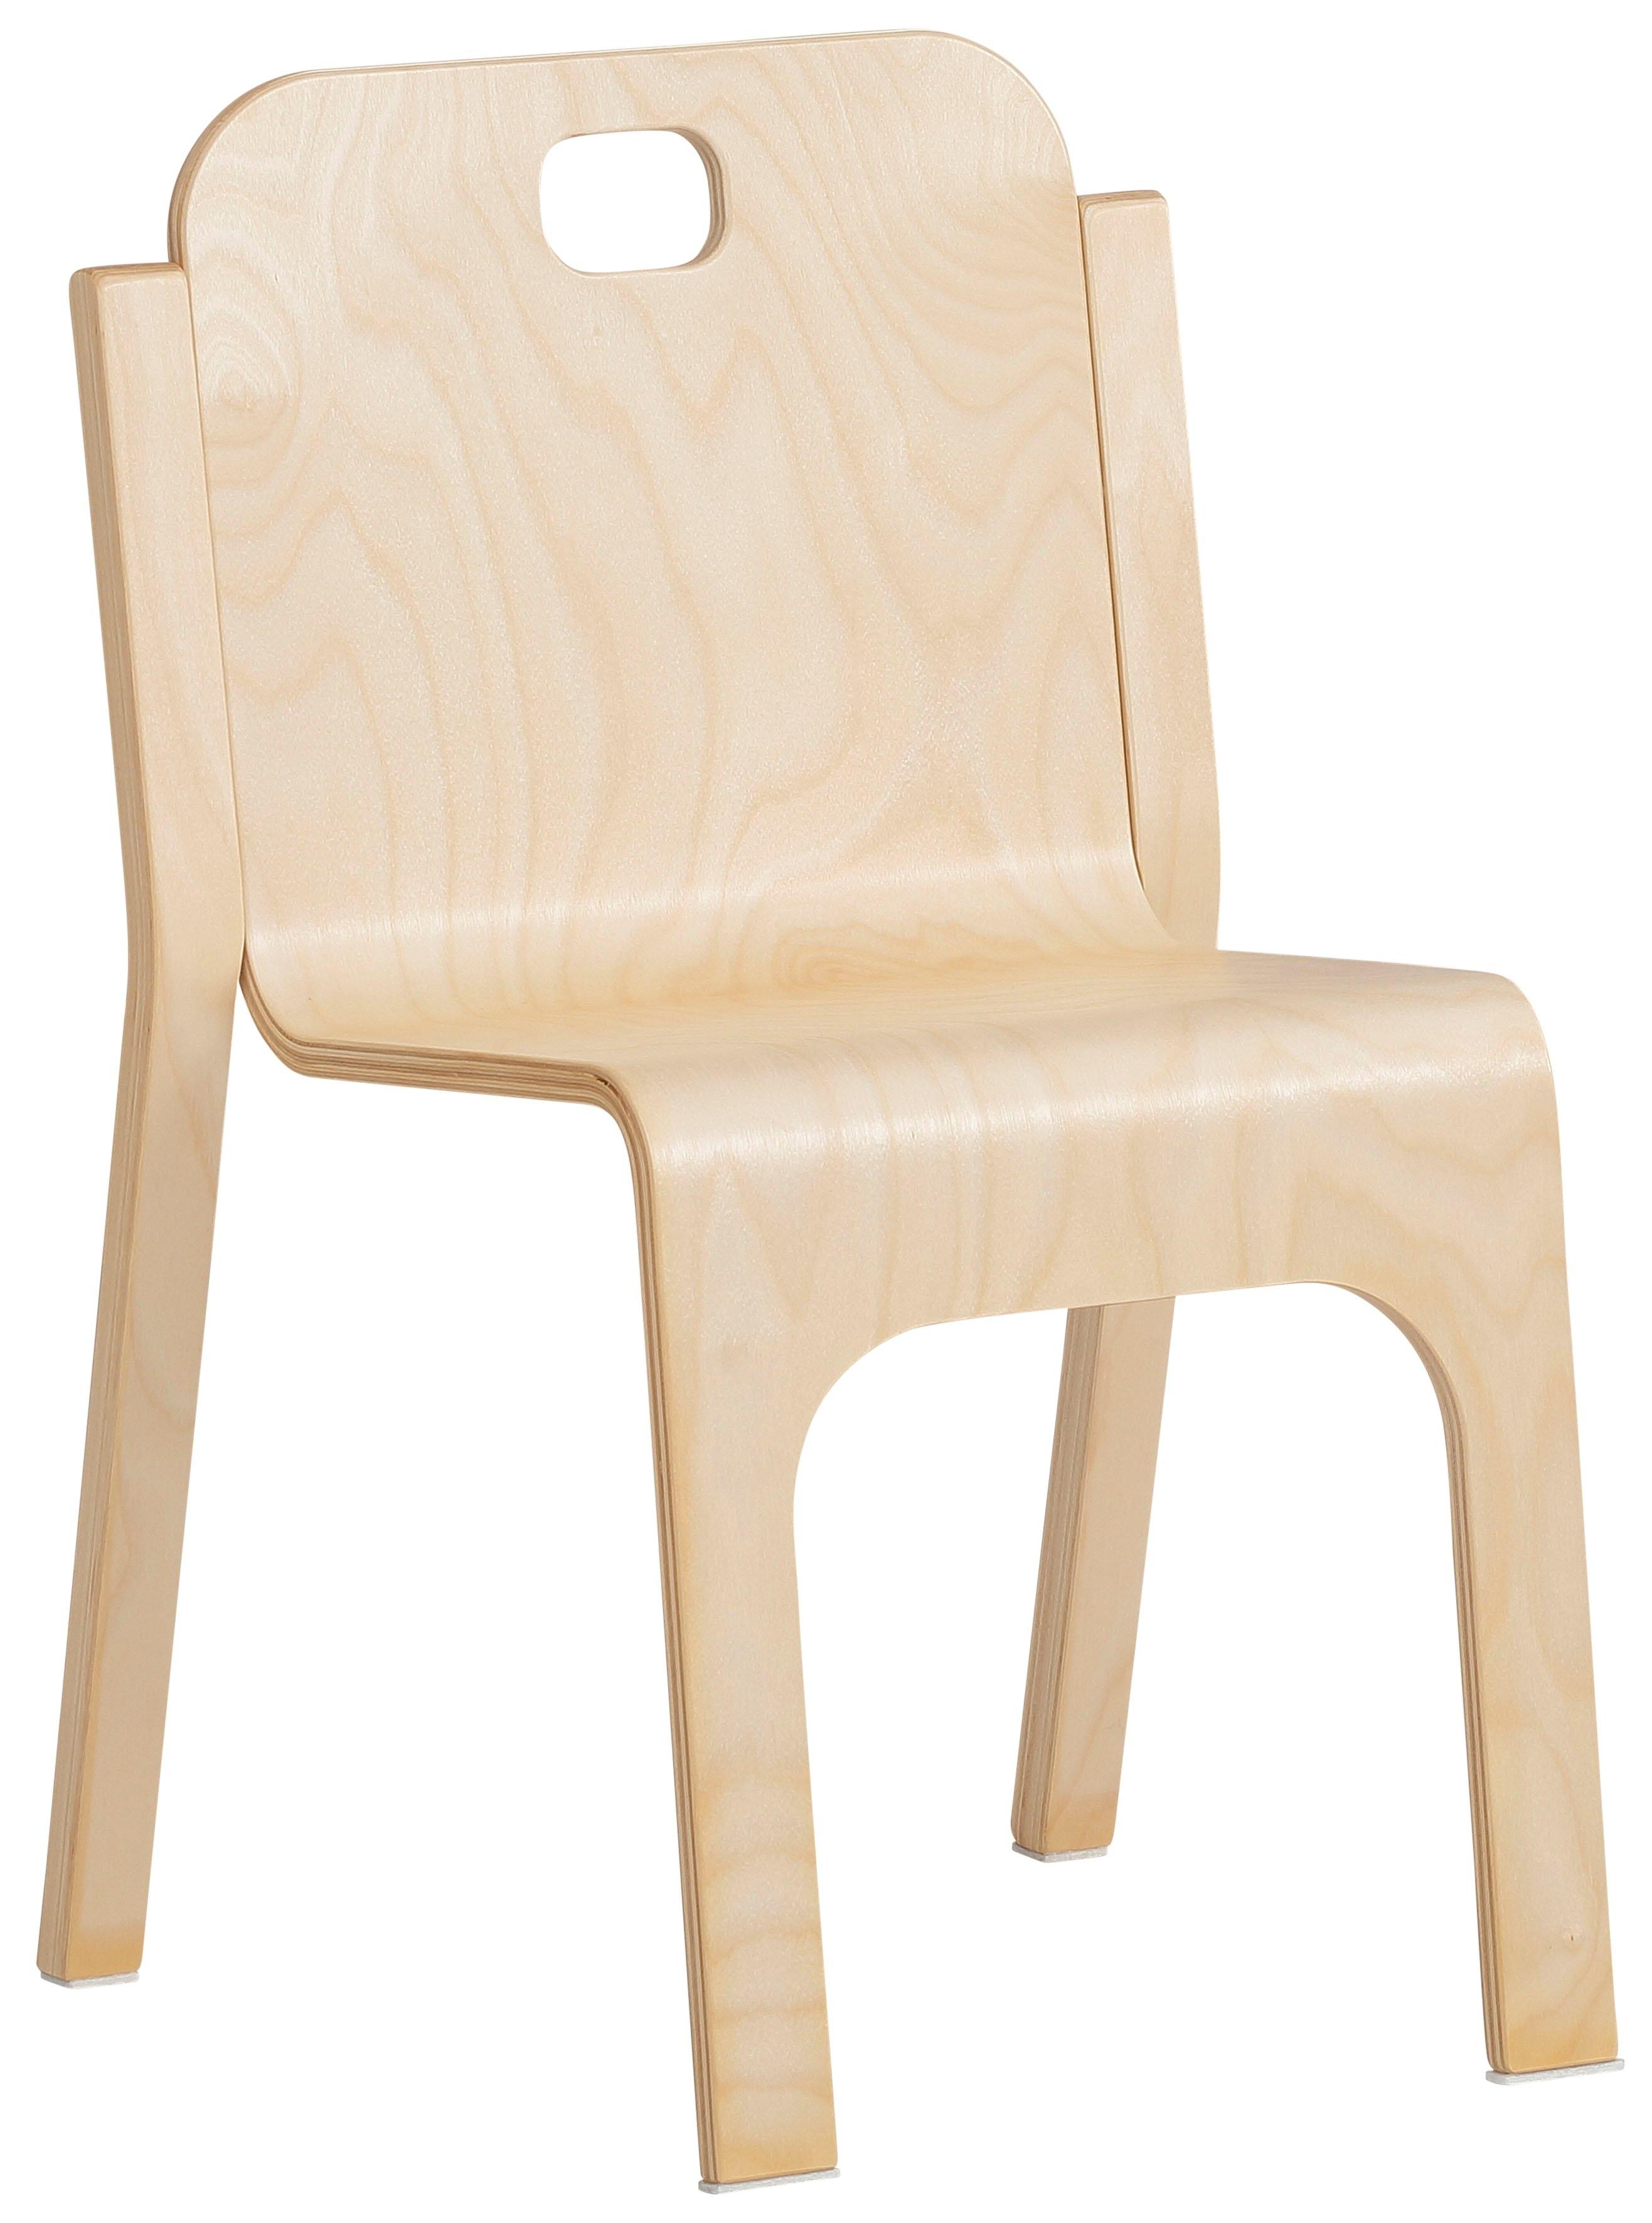 Lüttenhütt Stoel Tommy Kinderstoel in de webshop van OTTO kopen